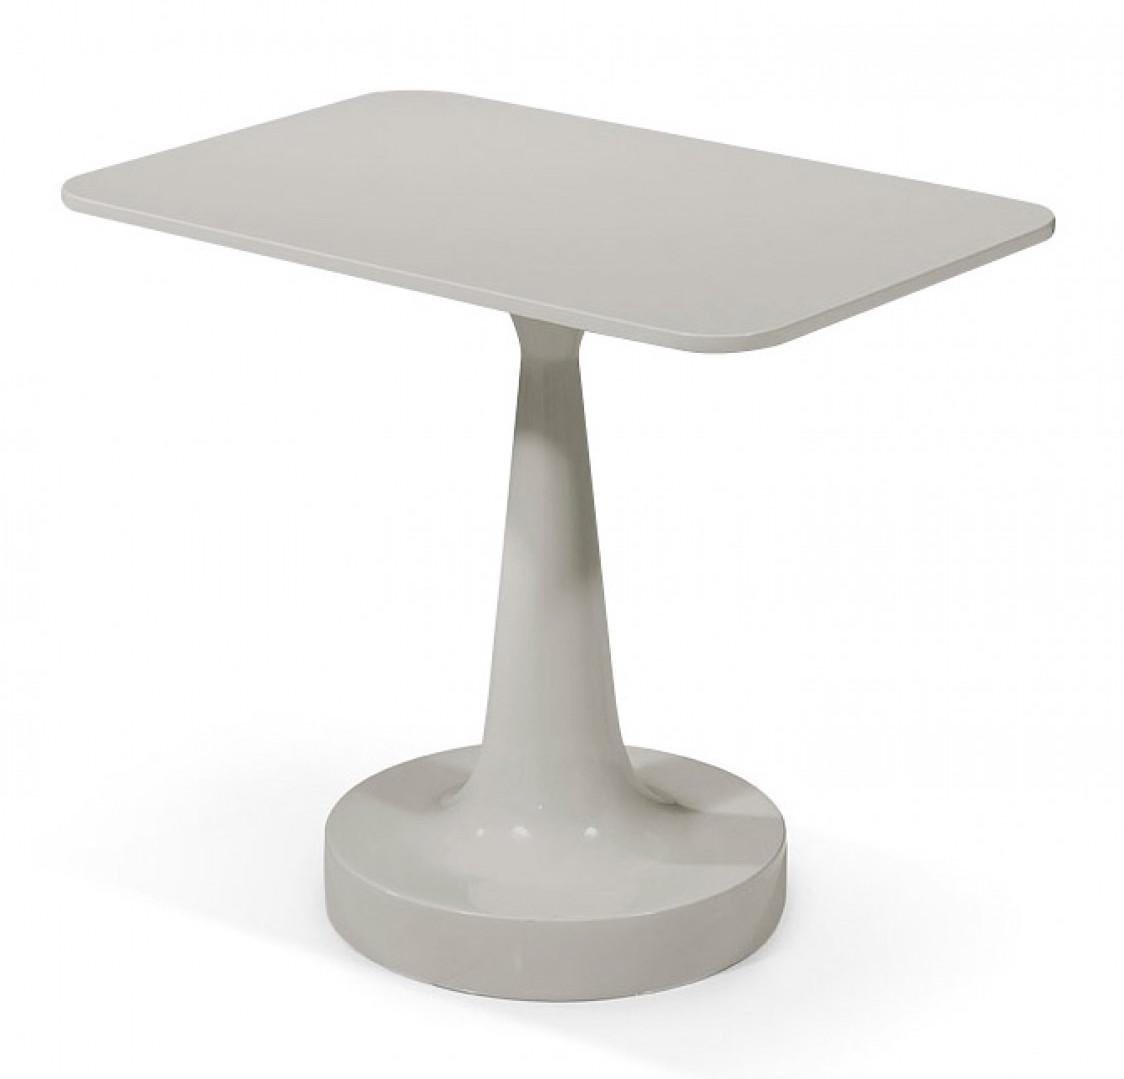 flow-side-table-gray.jpg